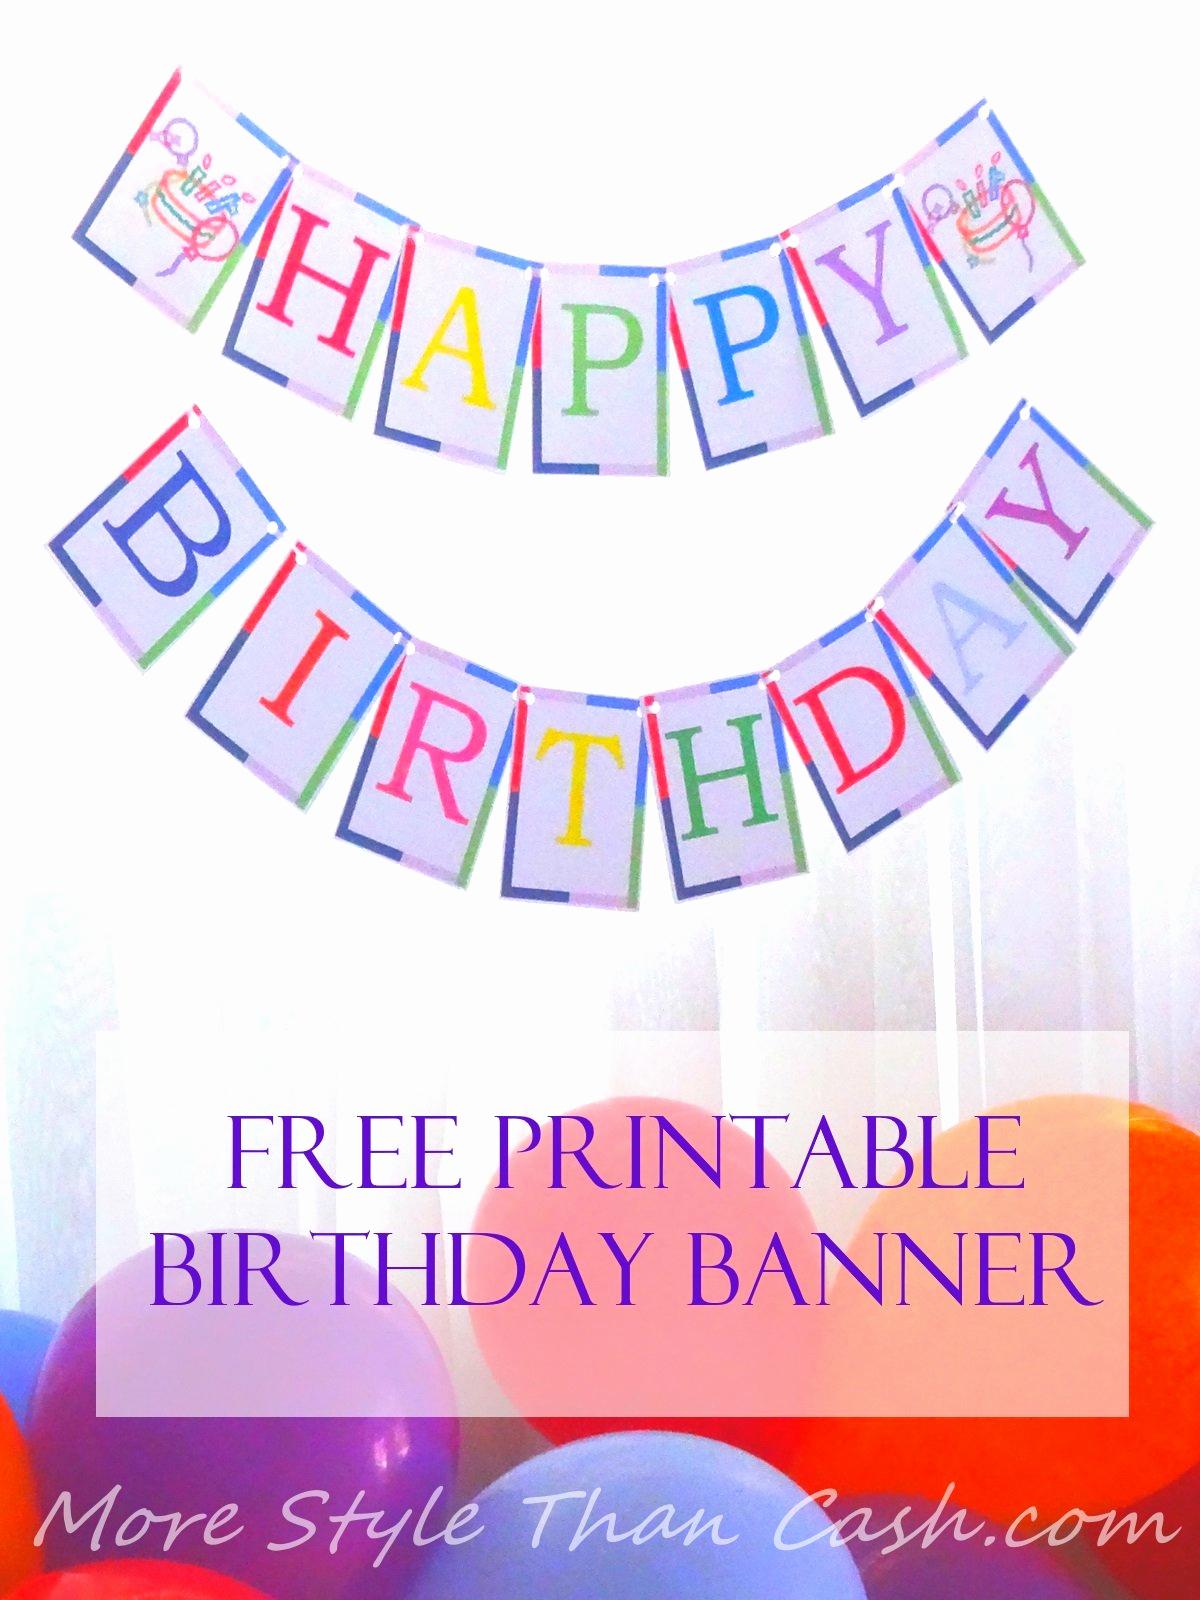 Printable Happy Birthday Banners Fresh Free Printable Birthday Banner